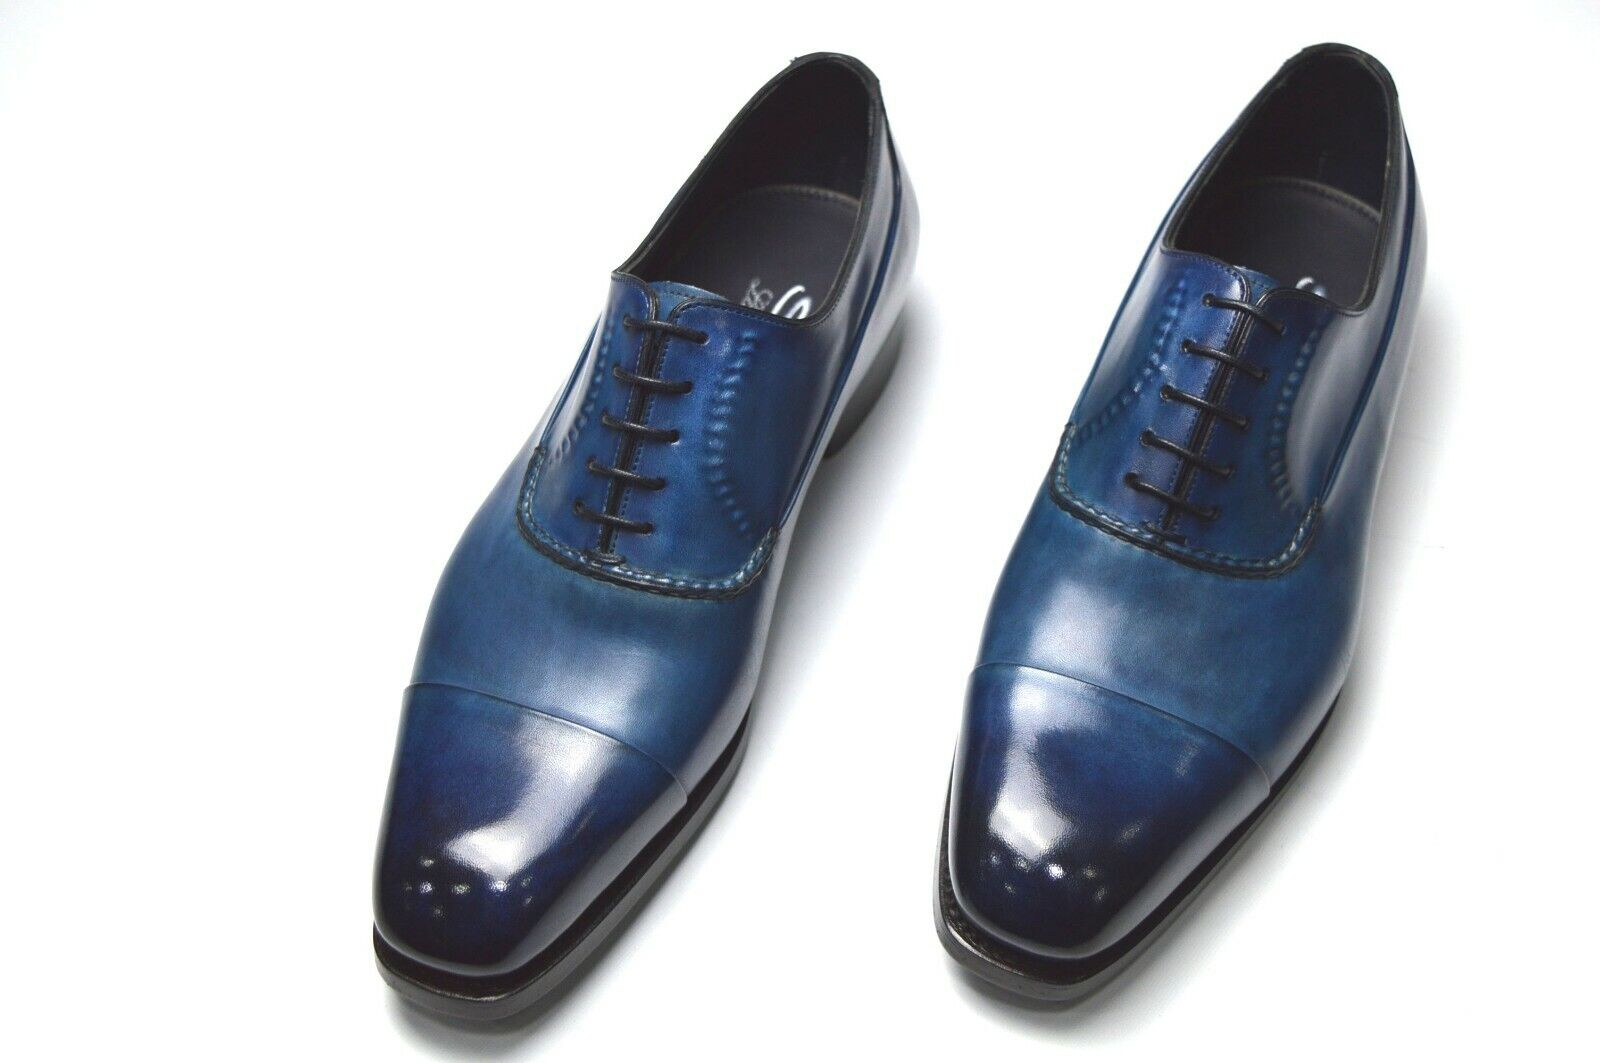 NEW SANTONI Dress  LIMITED EDITION scarpe Dimensione Eu 44 Uk 10 Us 11 (Led7)